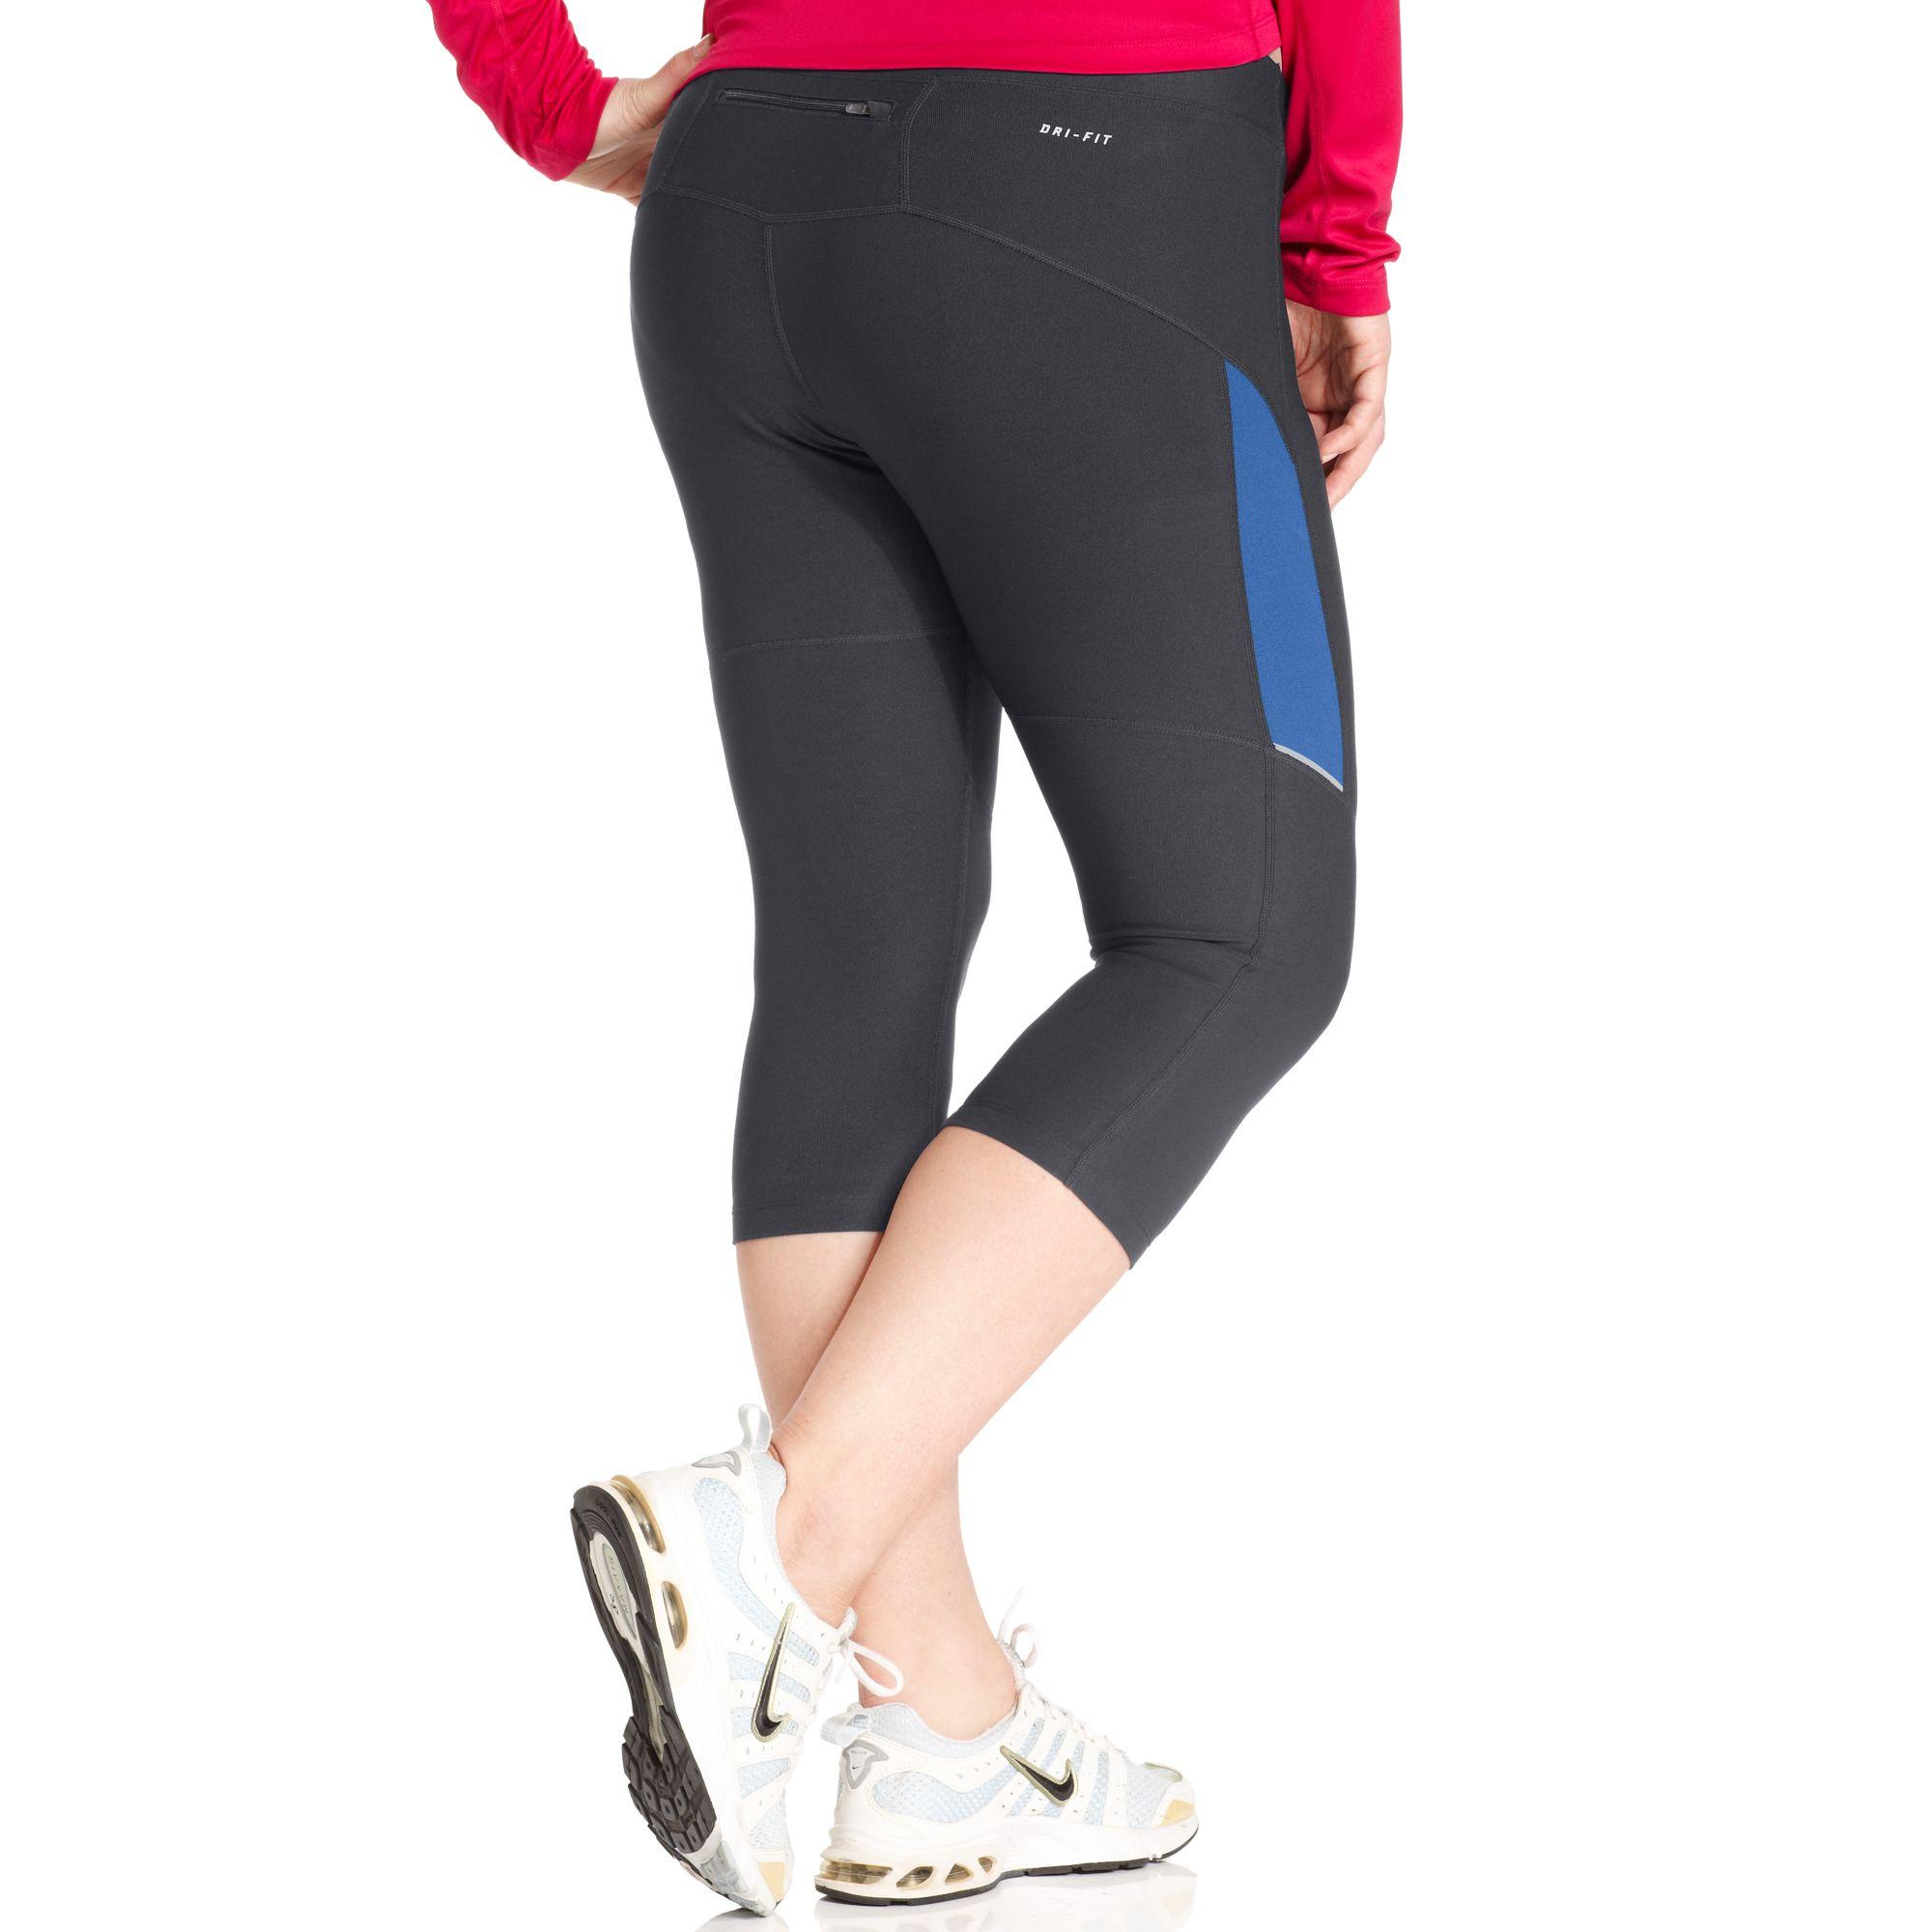 Nike Drifit Active Capri Leggings in Gray (anthracite/distance blue)   Lyst